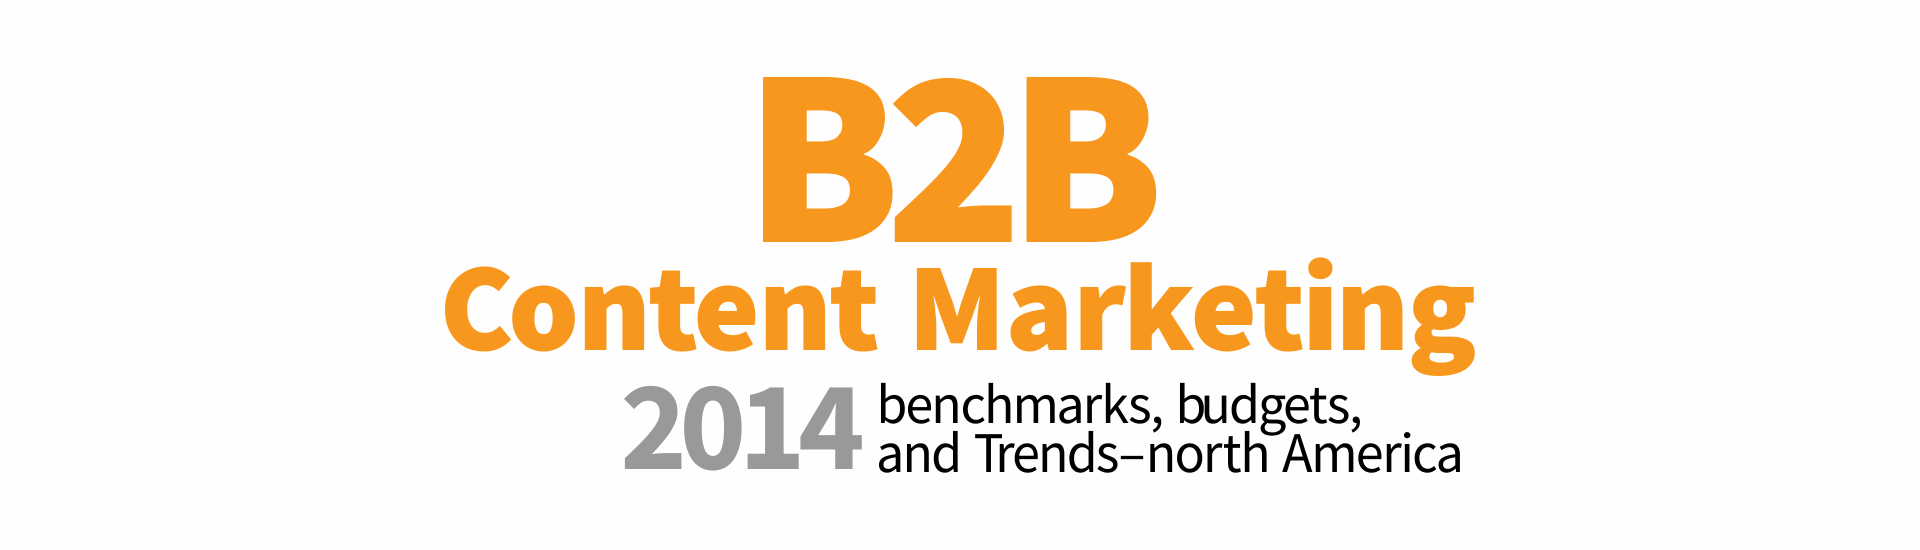 Отчёт по исследованию Content Marketing Institute